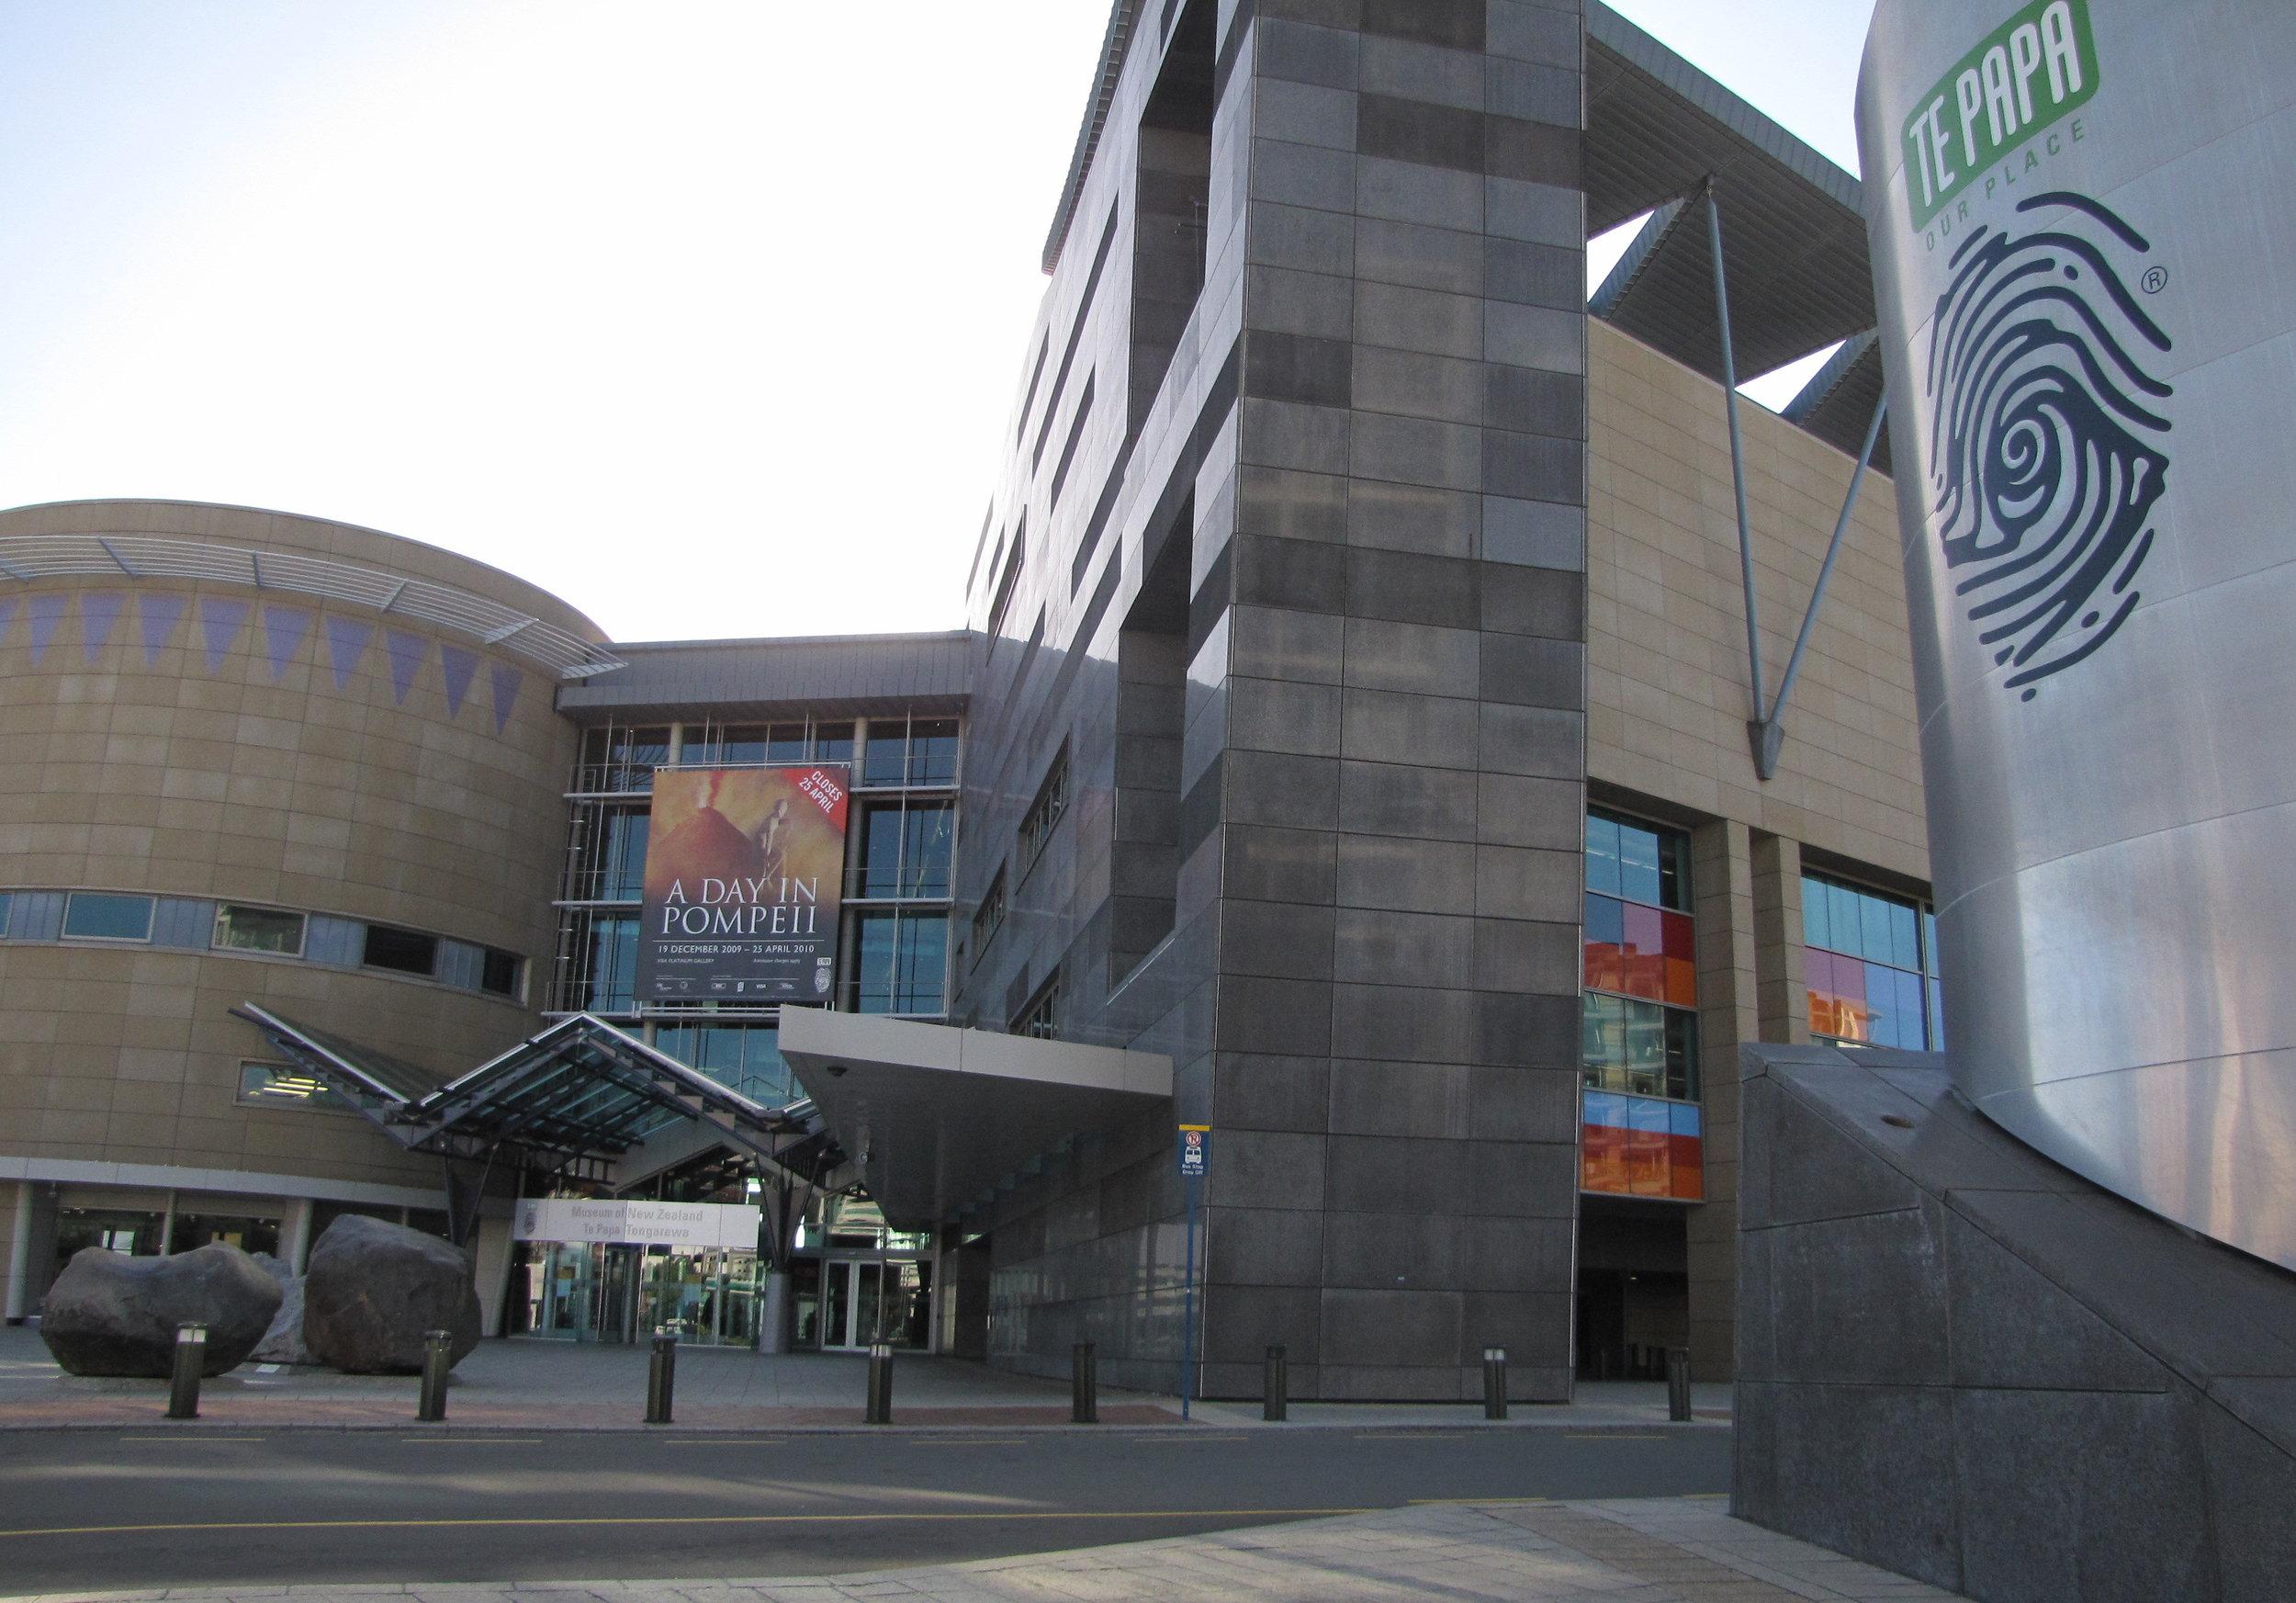 Wellington's world class museum, Te Papa.